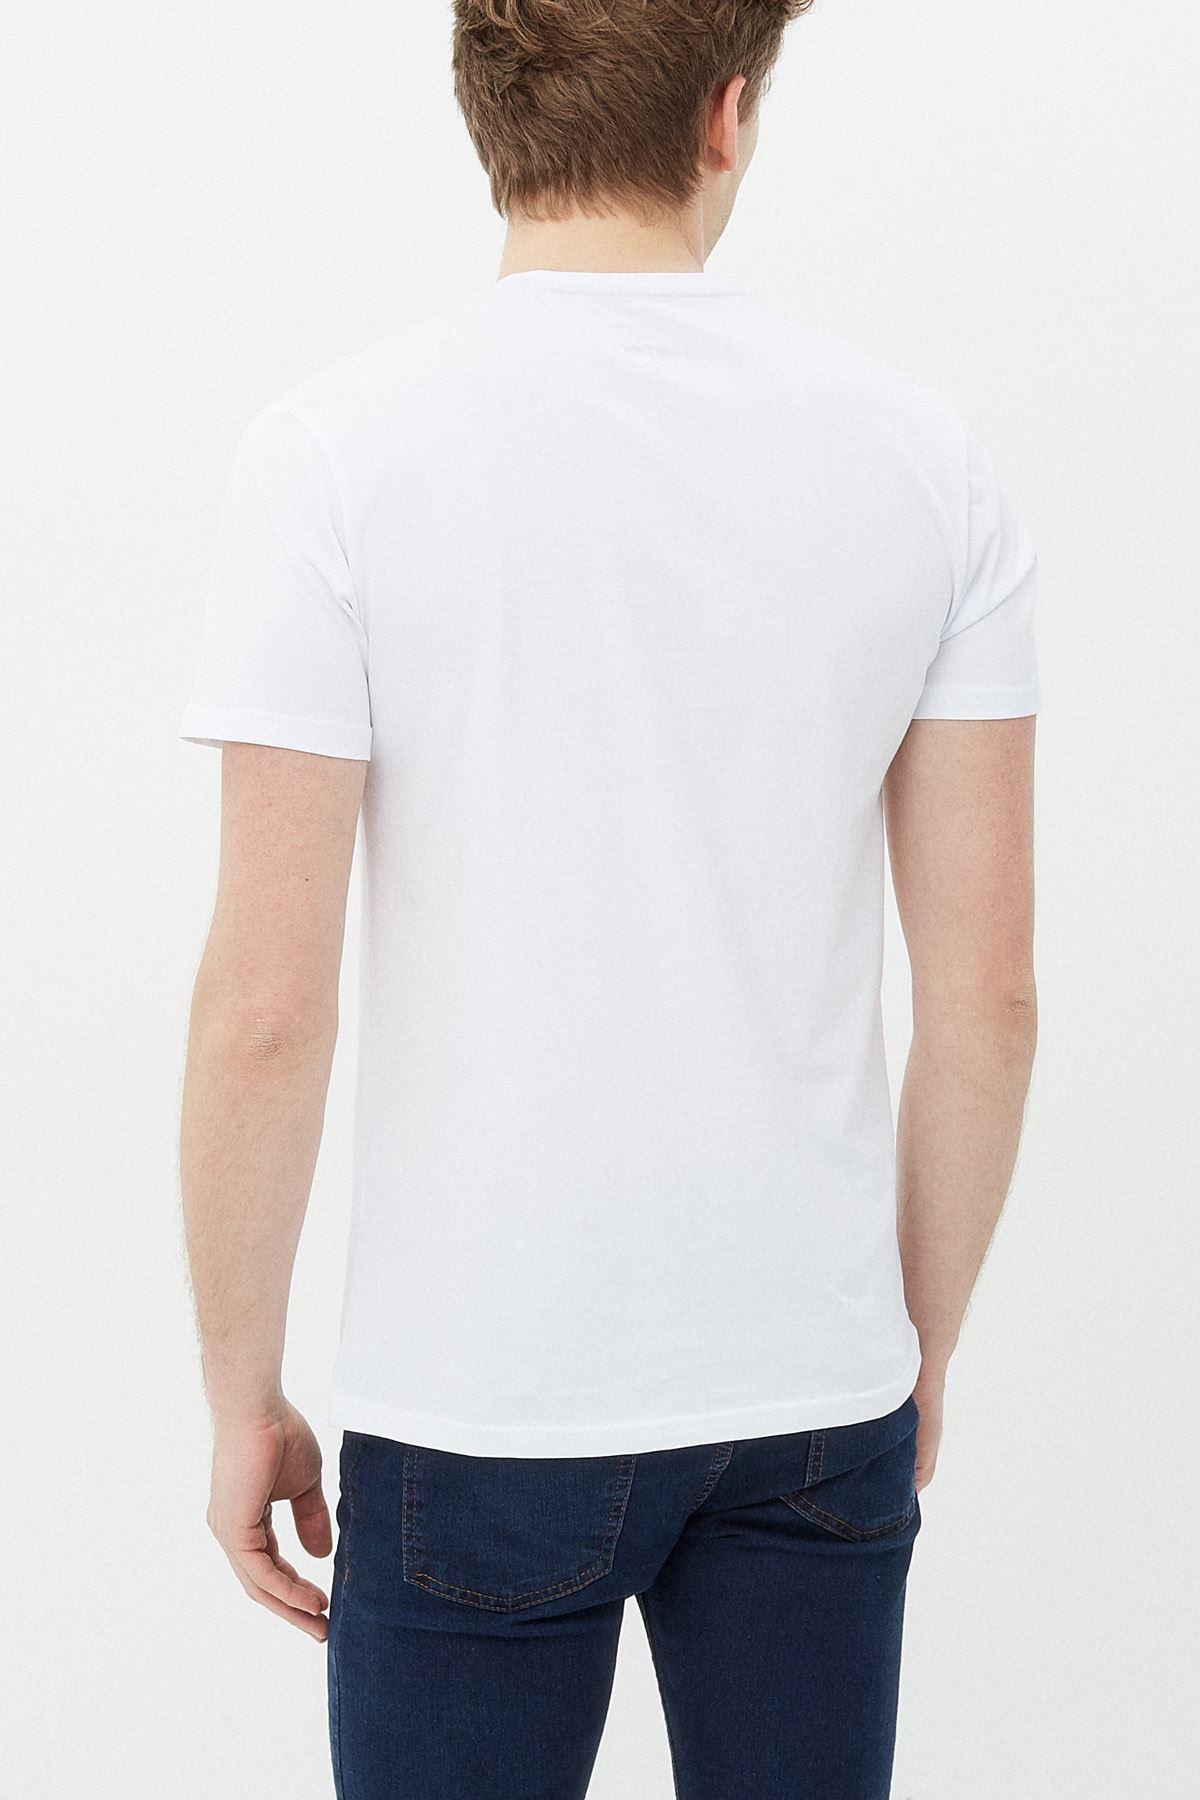 Naruto Anime 14 Beyaz Erkek Tshirt - Tişört